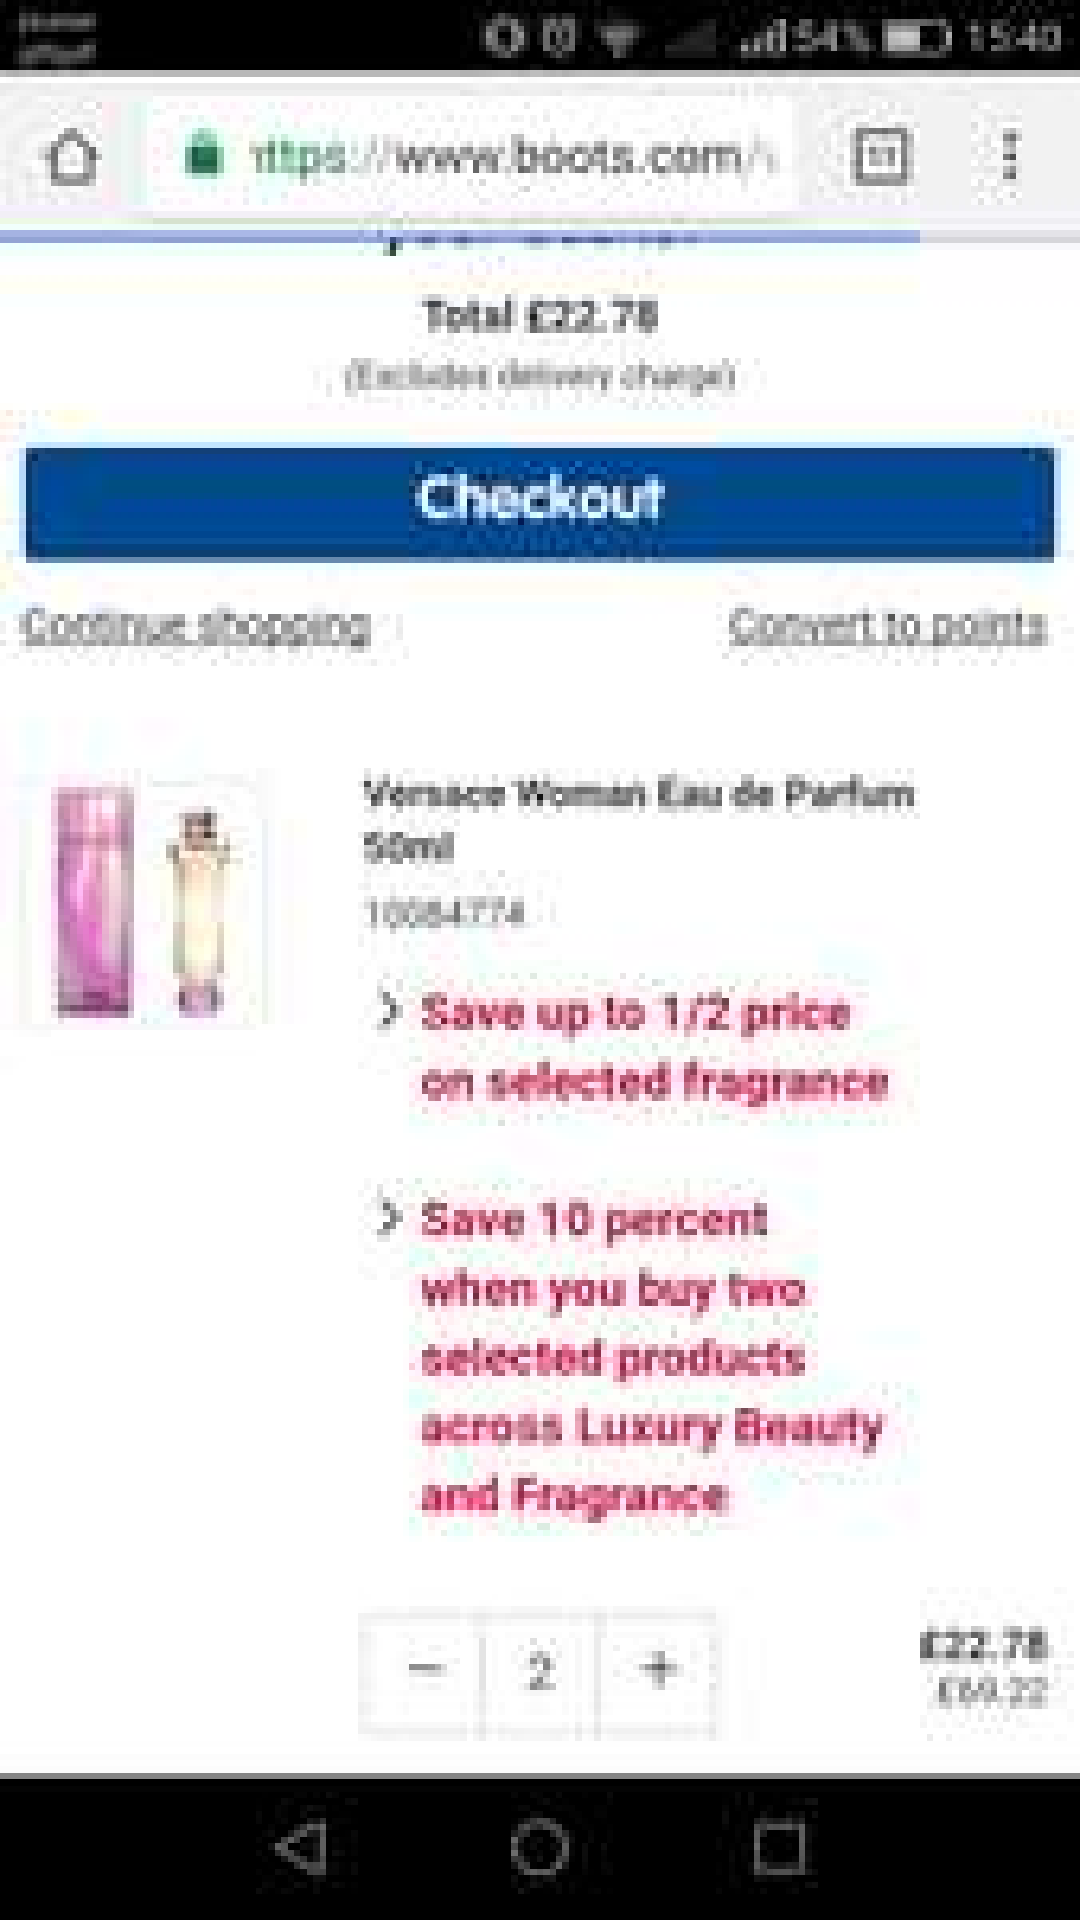 Versace woman edp 2x50ml 22.78 @ Boots